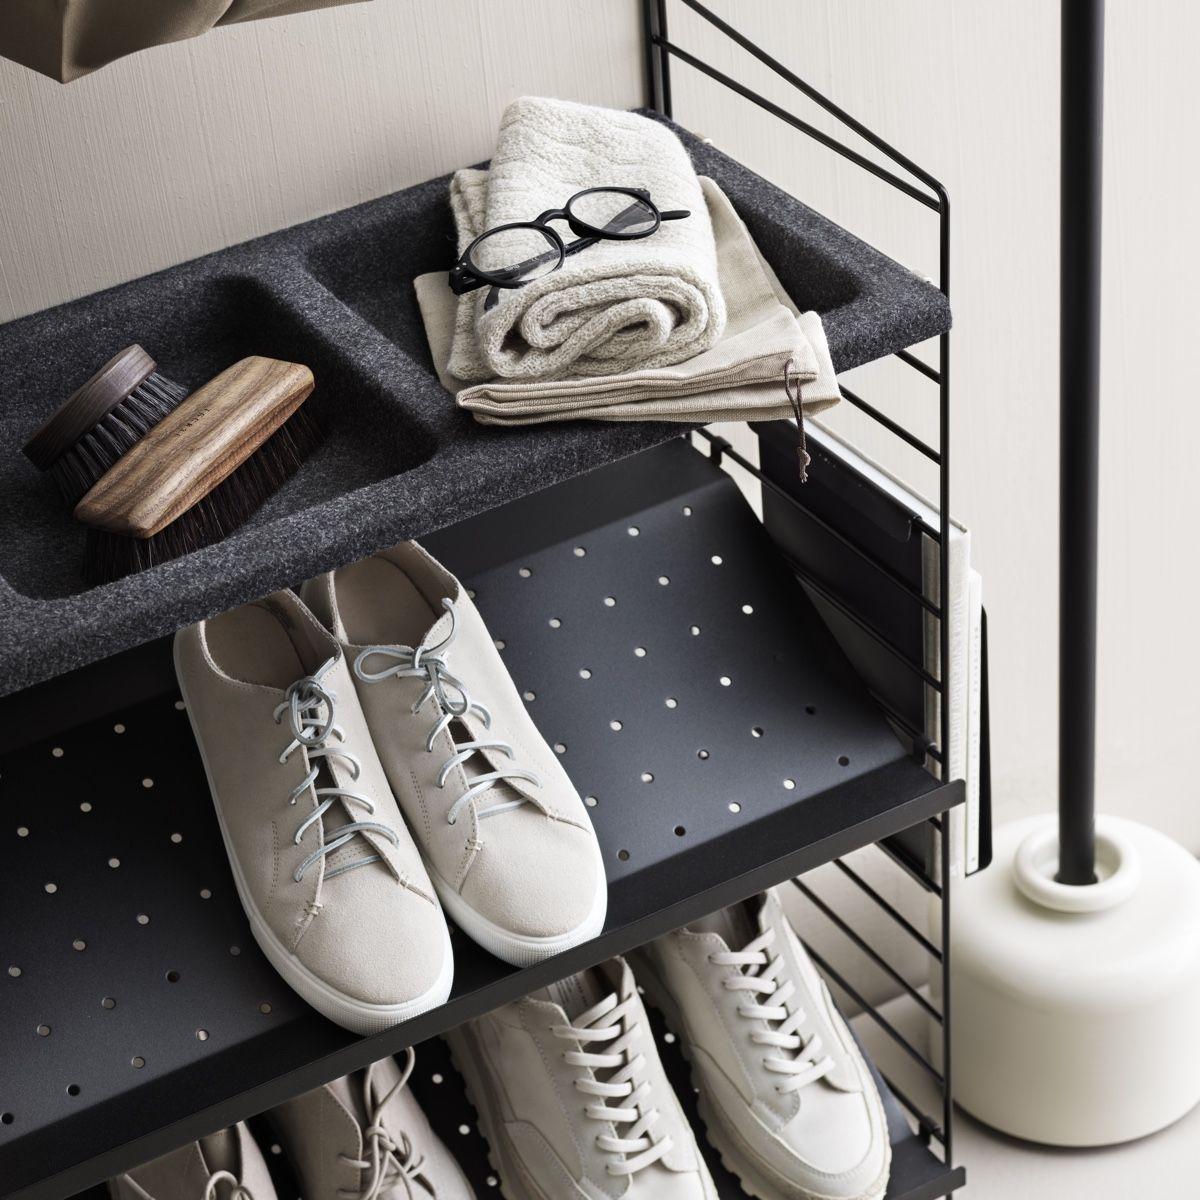 String Shoe Shelf 78 x 30cm